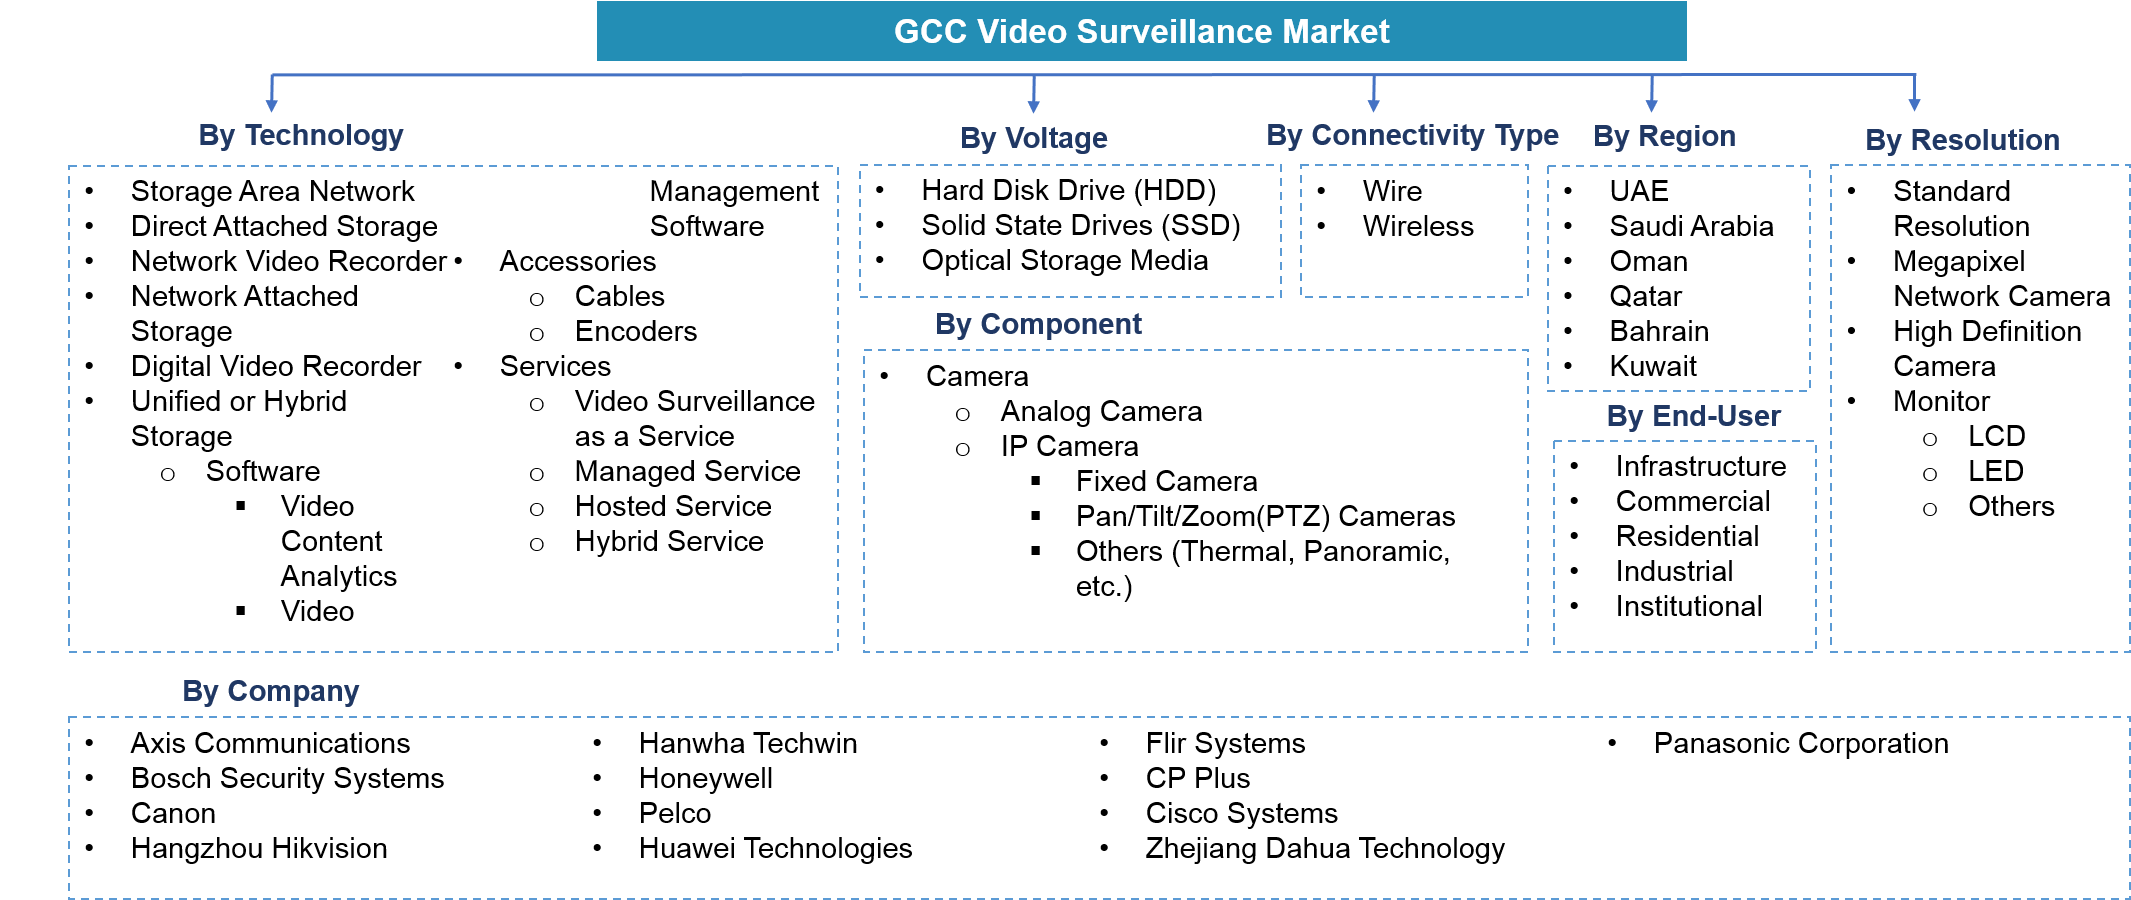 GCC Video Surveillance Market Segmentation